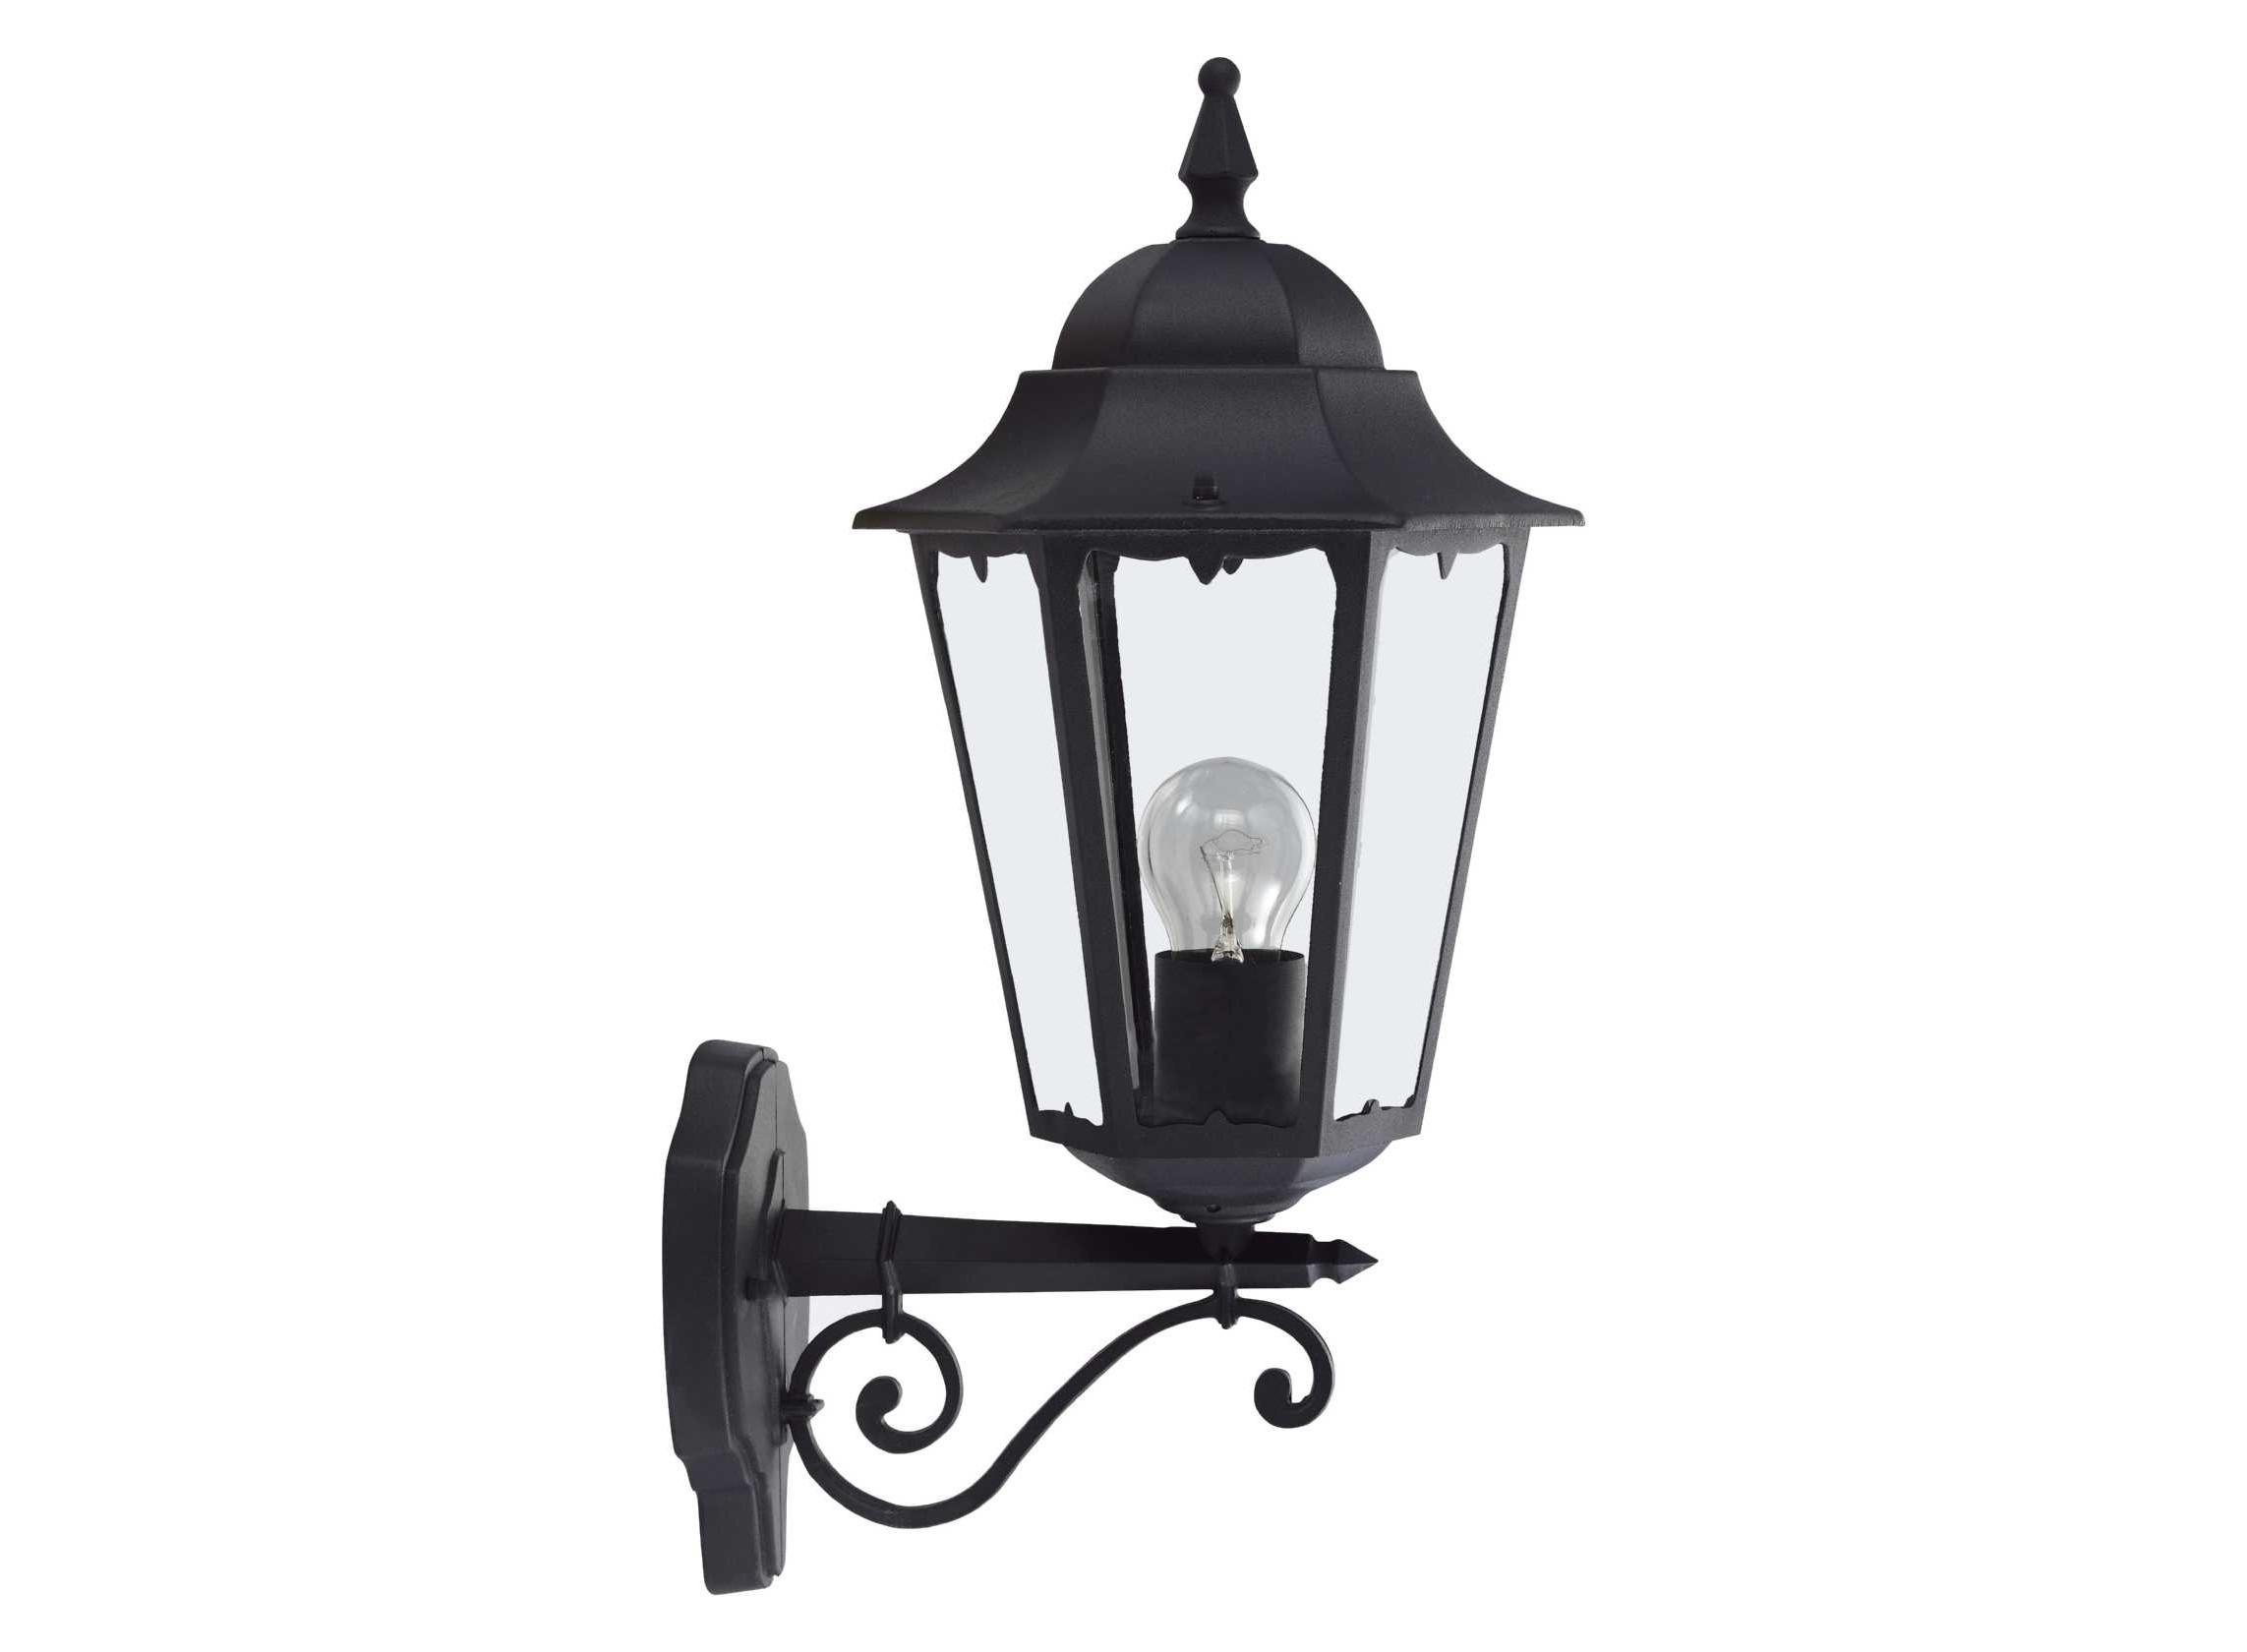 Светильник уличный CORNWALLУличные настенные светильники<br>&amp;lt;div&amp;gt;Вид цоколя: Е27&amp;lt;/div&amp;gt;&amp;lt;div&amp;gt;Мощность лампы: 60W&amp;lt;/div&amp;gt;&amp;lt;div&amp;gt;Количество ламп: 1&amp;lt;/div&amp;gt;&amp;lt;div&amp;gt;Наличие ламп: нет&amp;lt;/div&amp;gt;<br><br>Material: Стекло<br>Width см: 25<br>Depth см: 30<br>Height см: 50